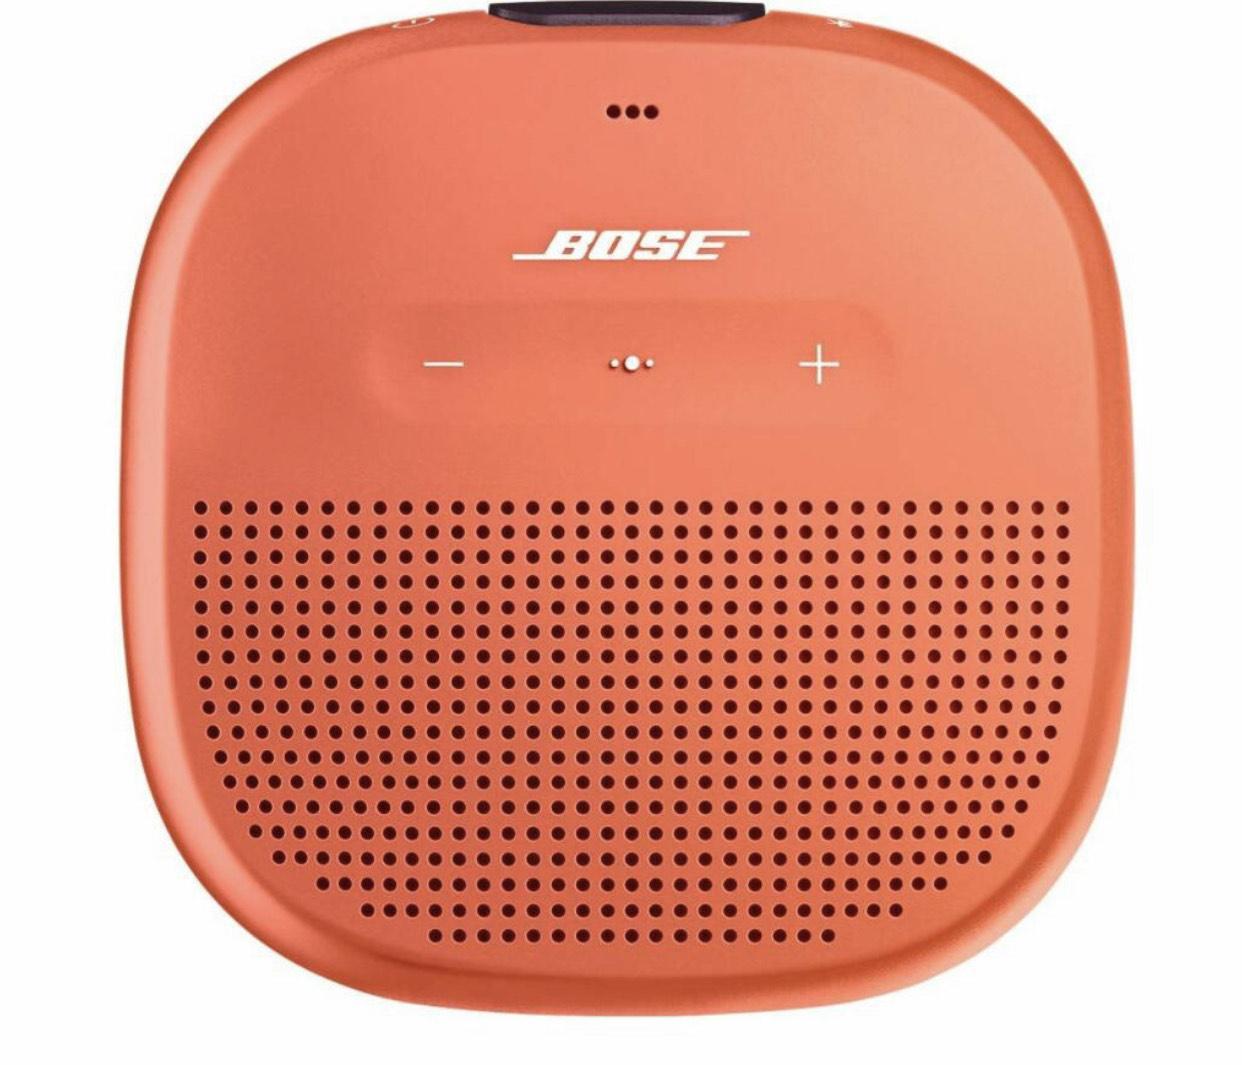 Bose SoundLink Bluetooth-Lautsprecher